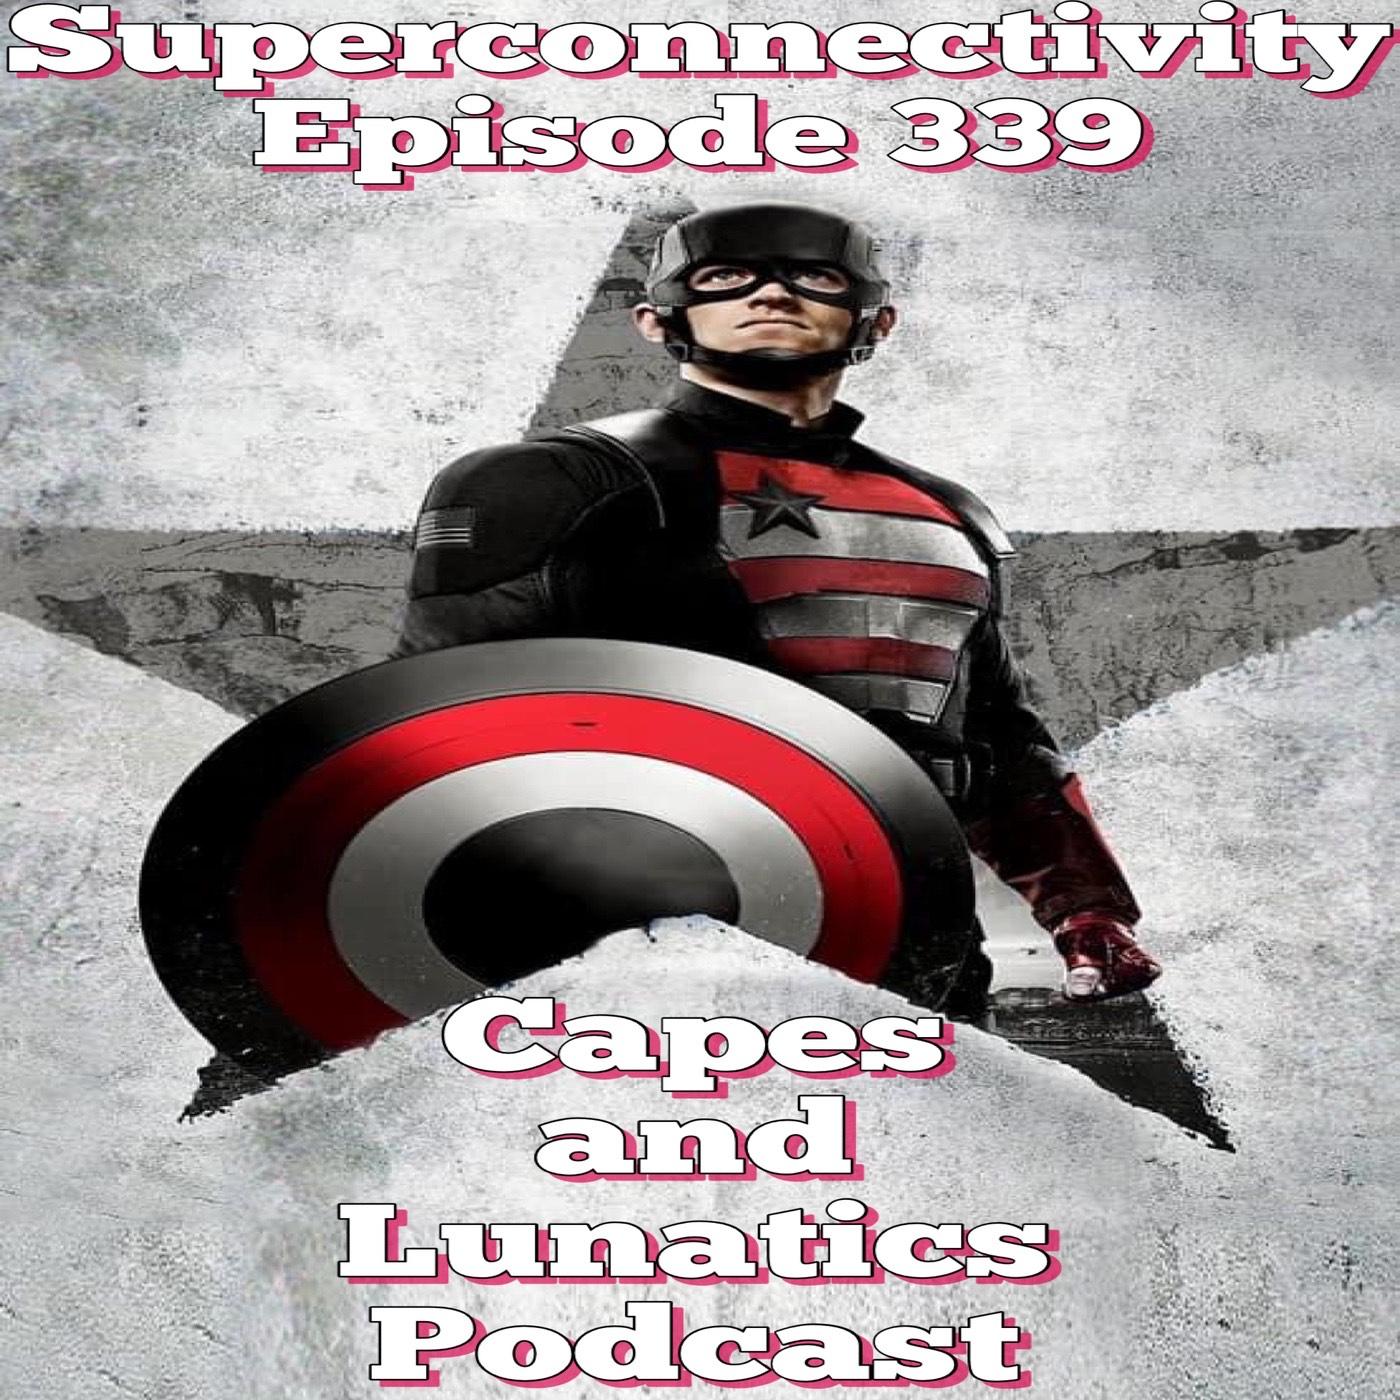 Superconnectivity Ep #339: John Walker - US Agent